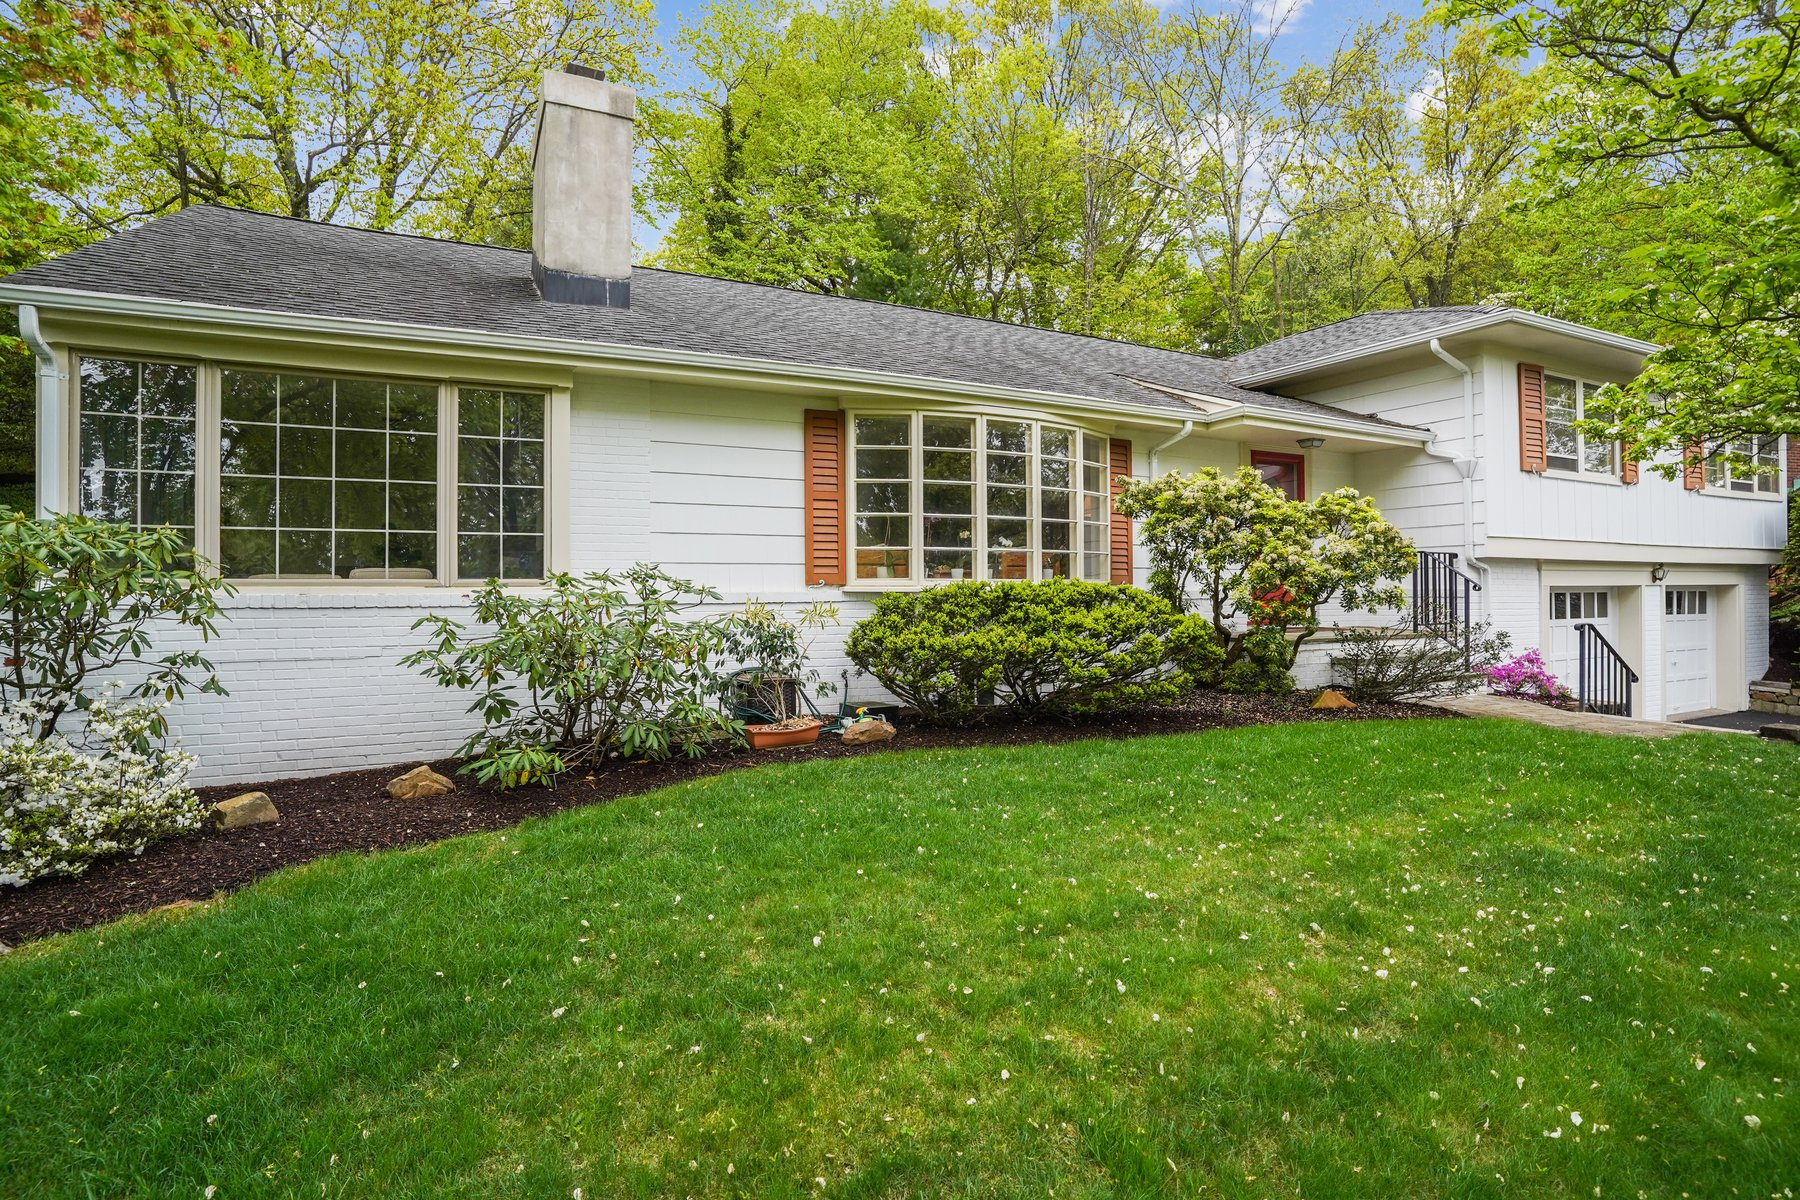 Casa a Summit, New Jersey, Stati Uniti 1 - 11447932